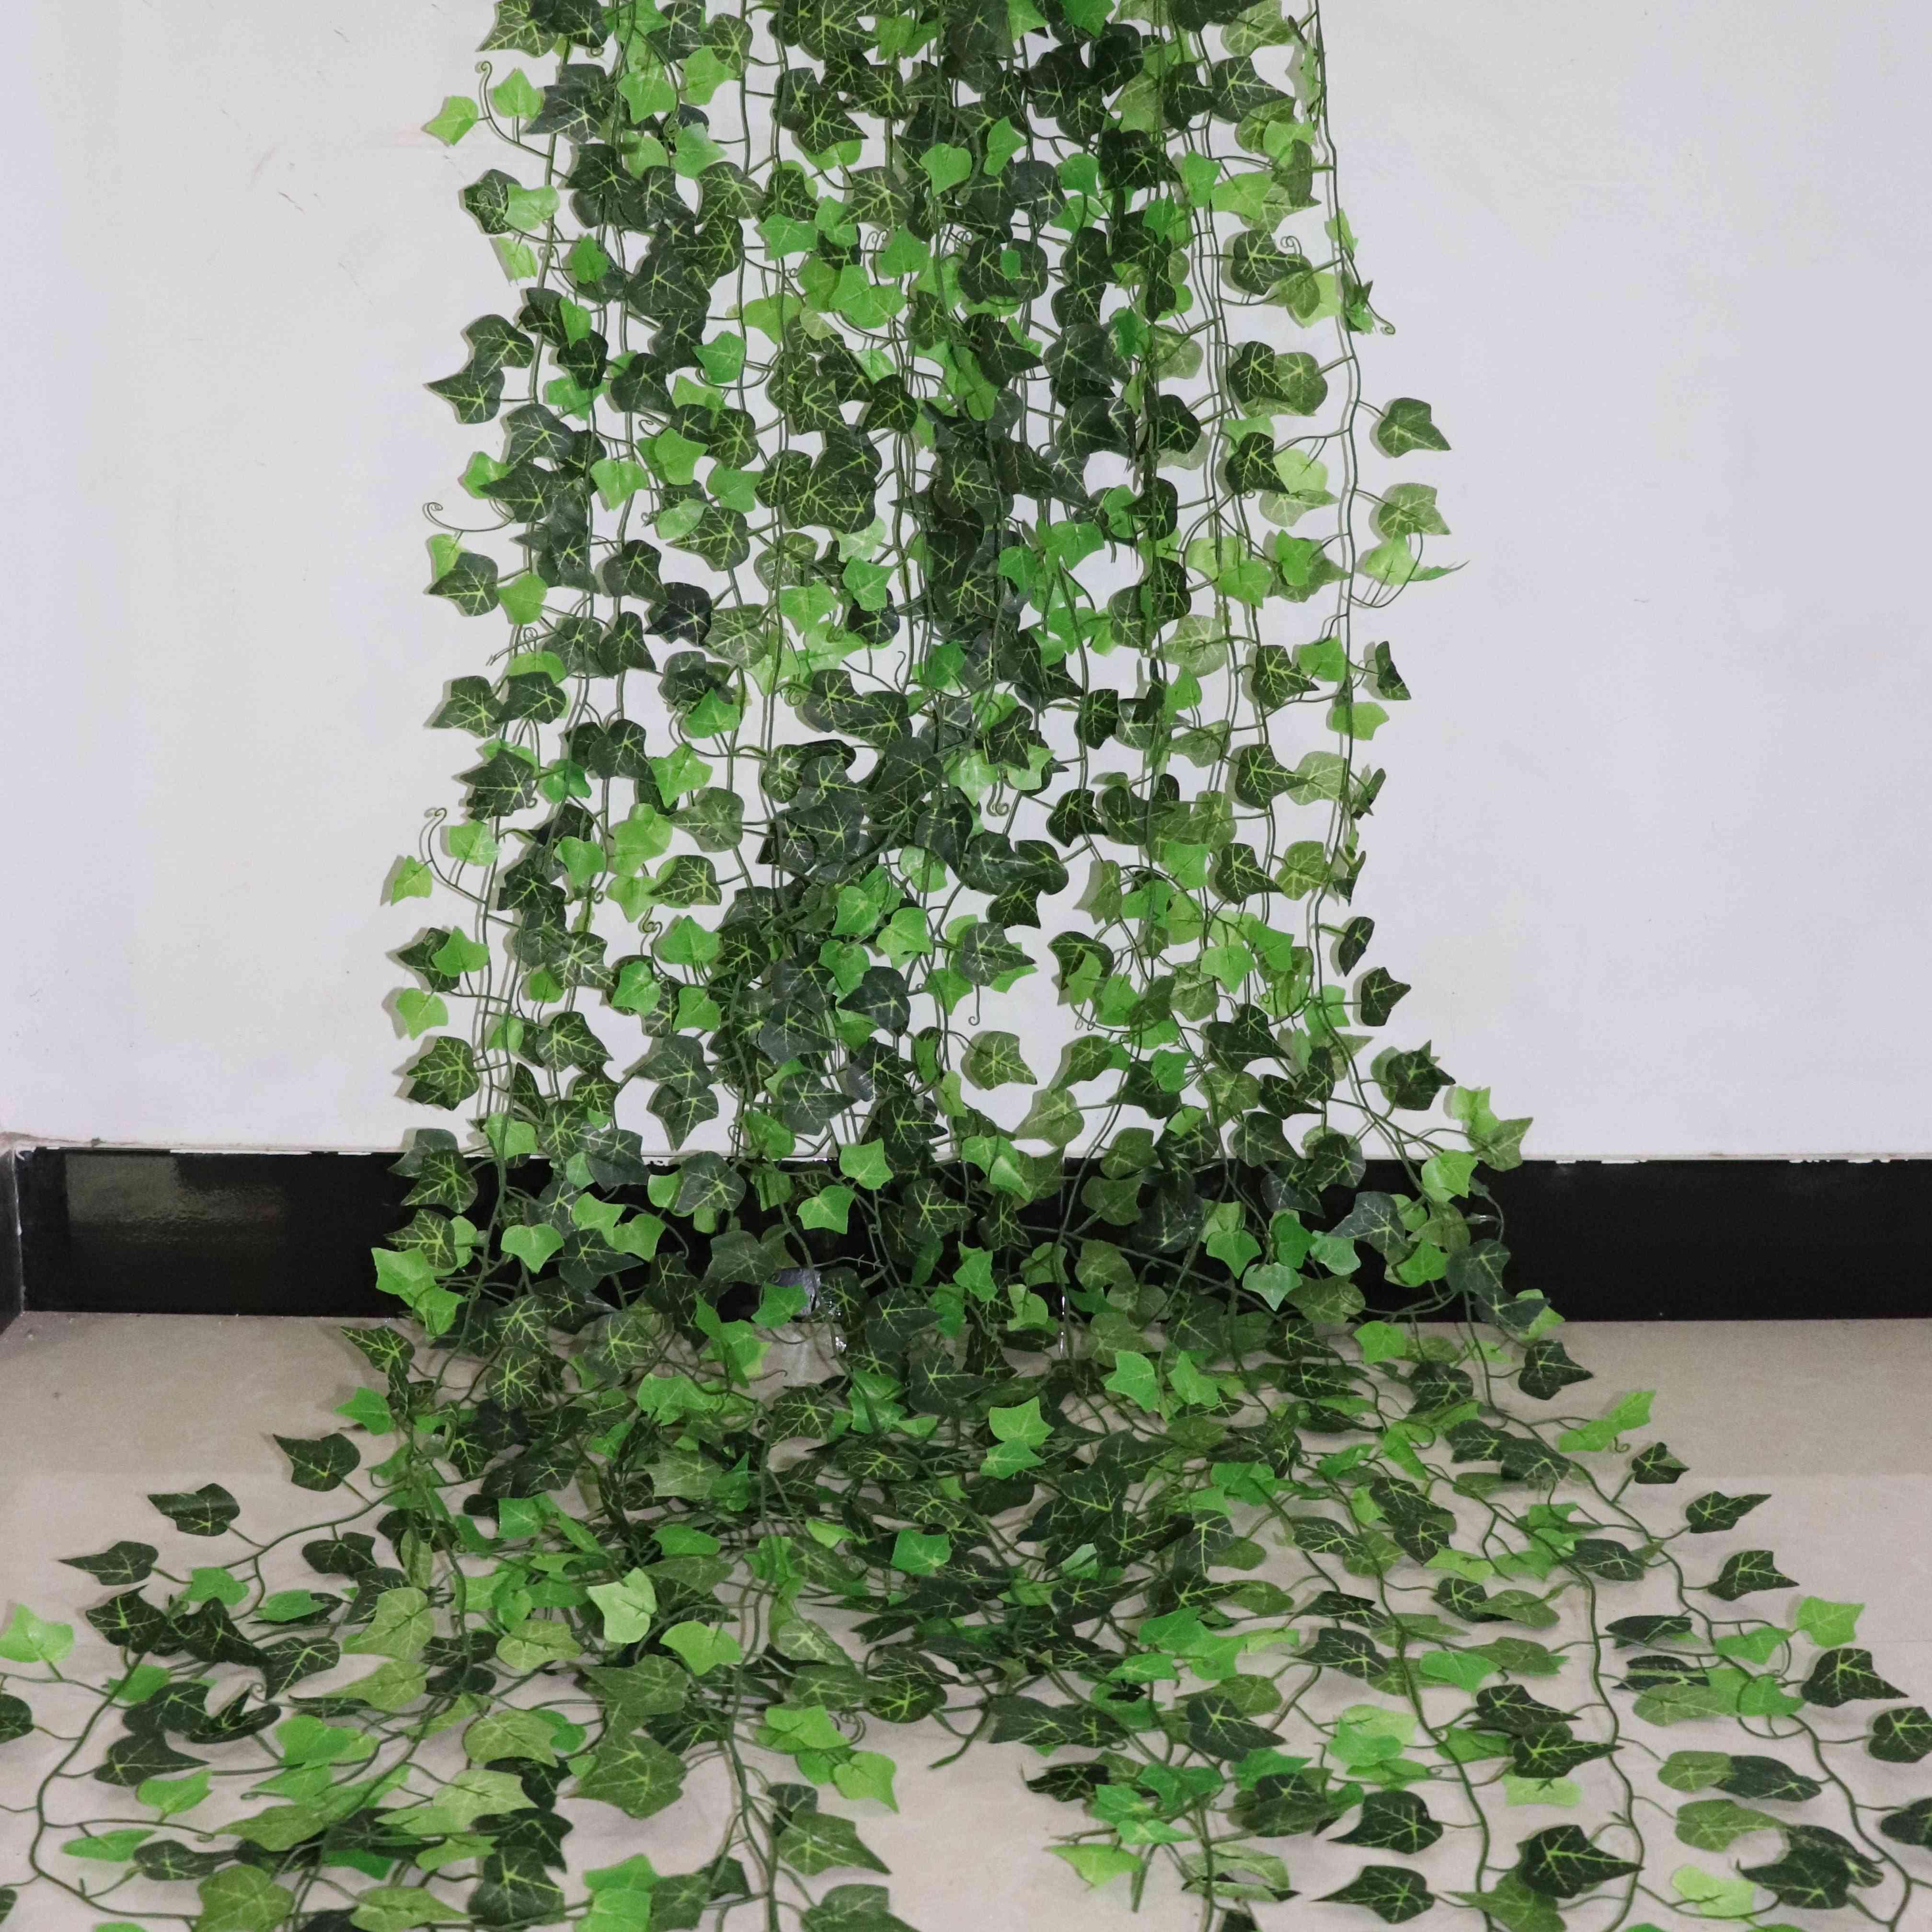 Home Decor Artificial Ivy Leaf Garland Plants - Vine Fake Foliage Flowers